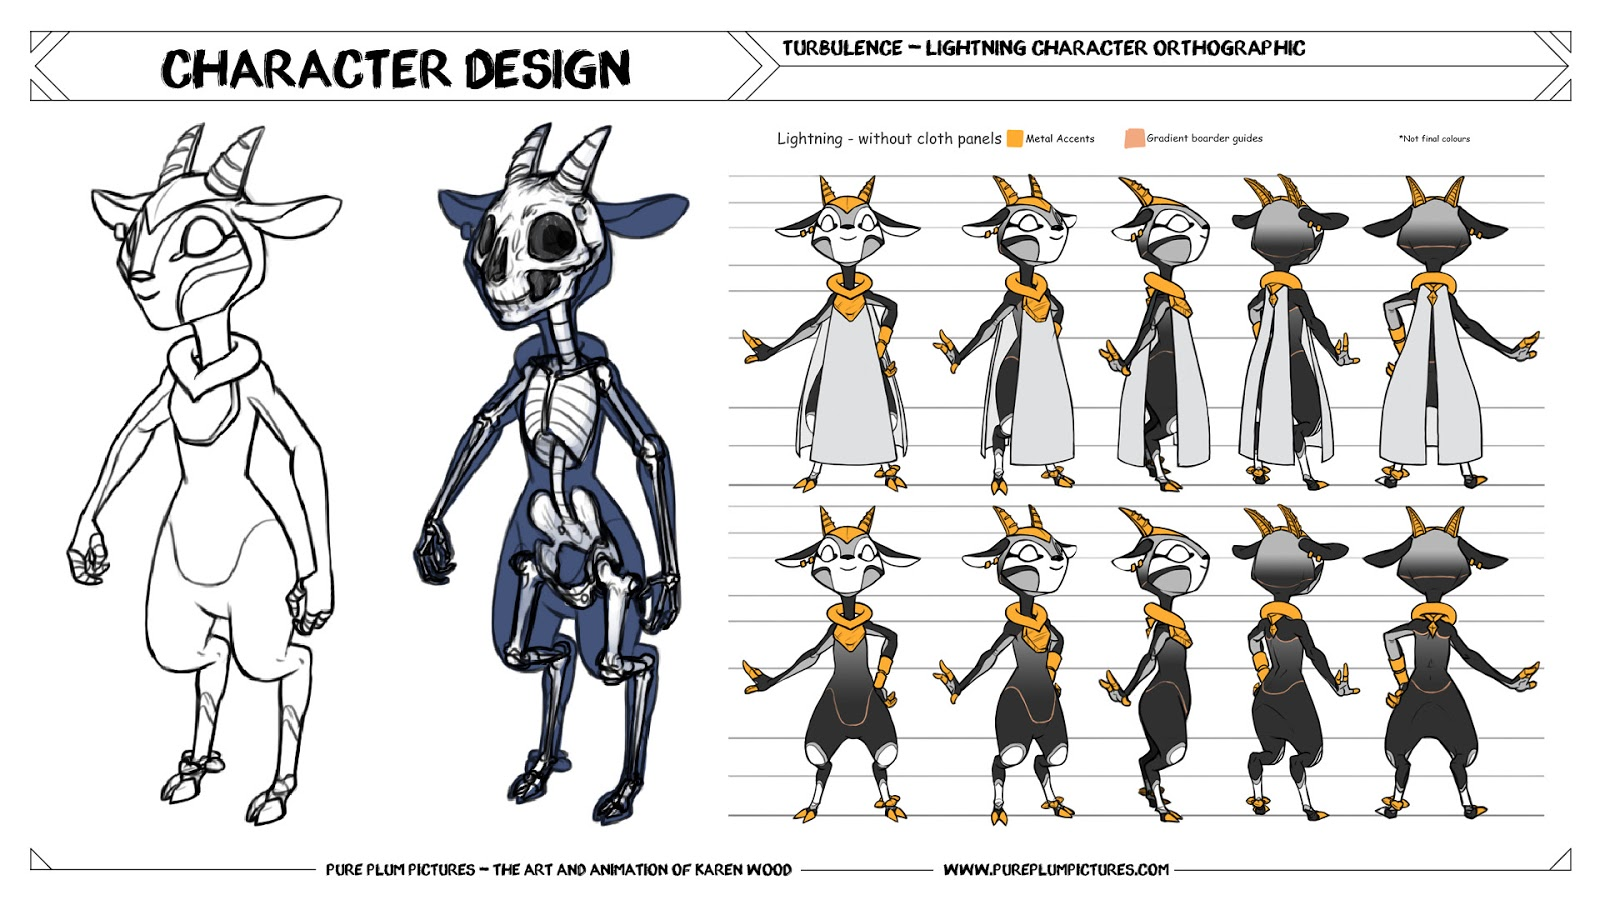 Character Design Courses University : Karen wood portfolio: animation story and design: turbulence